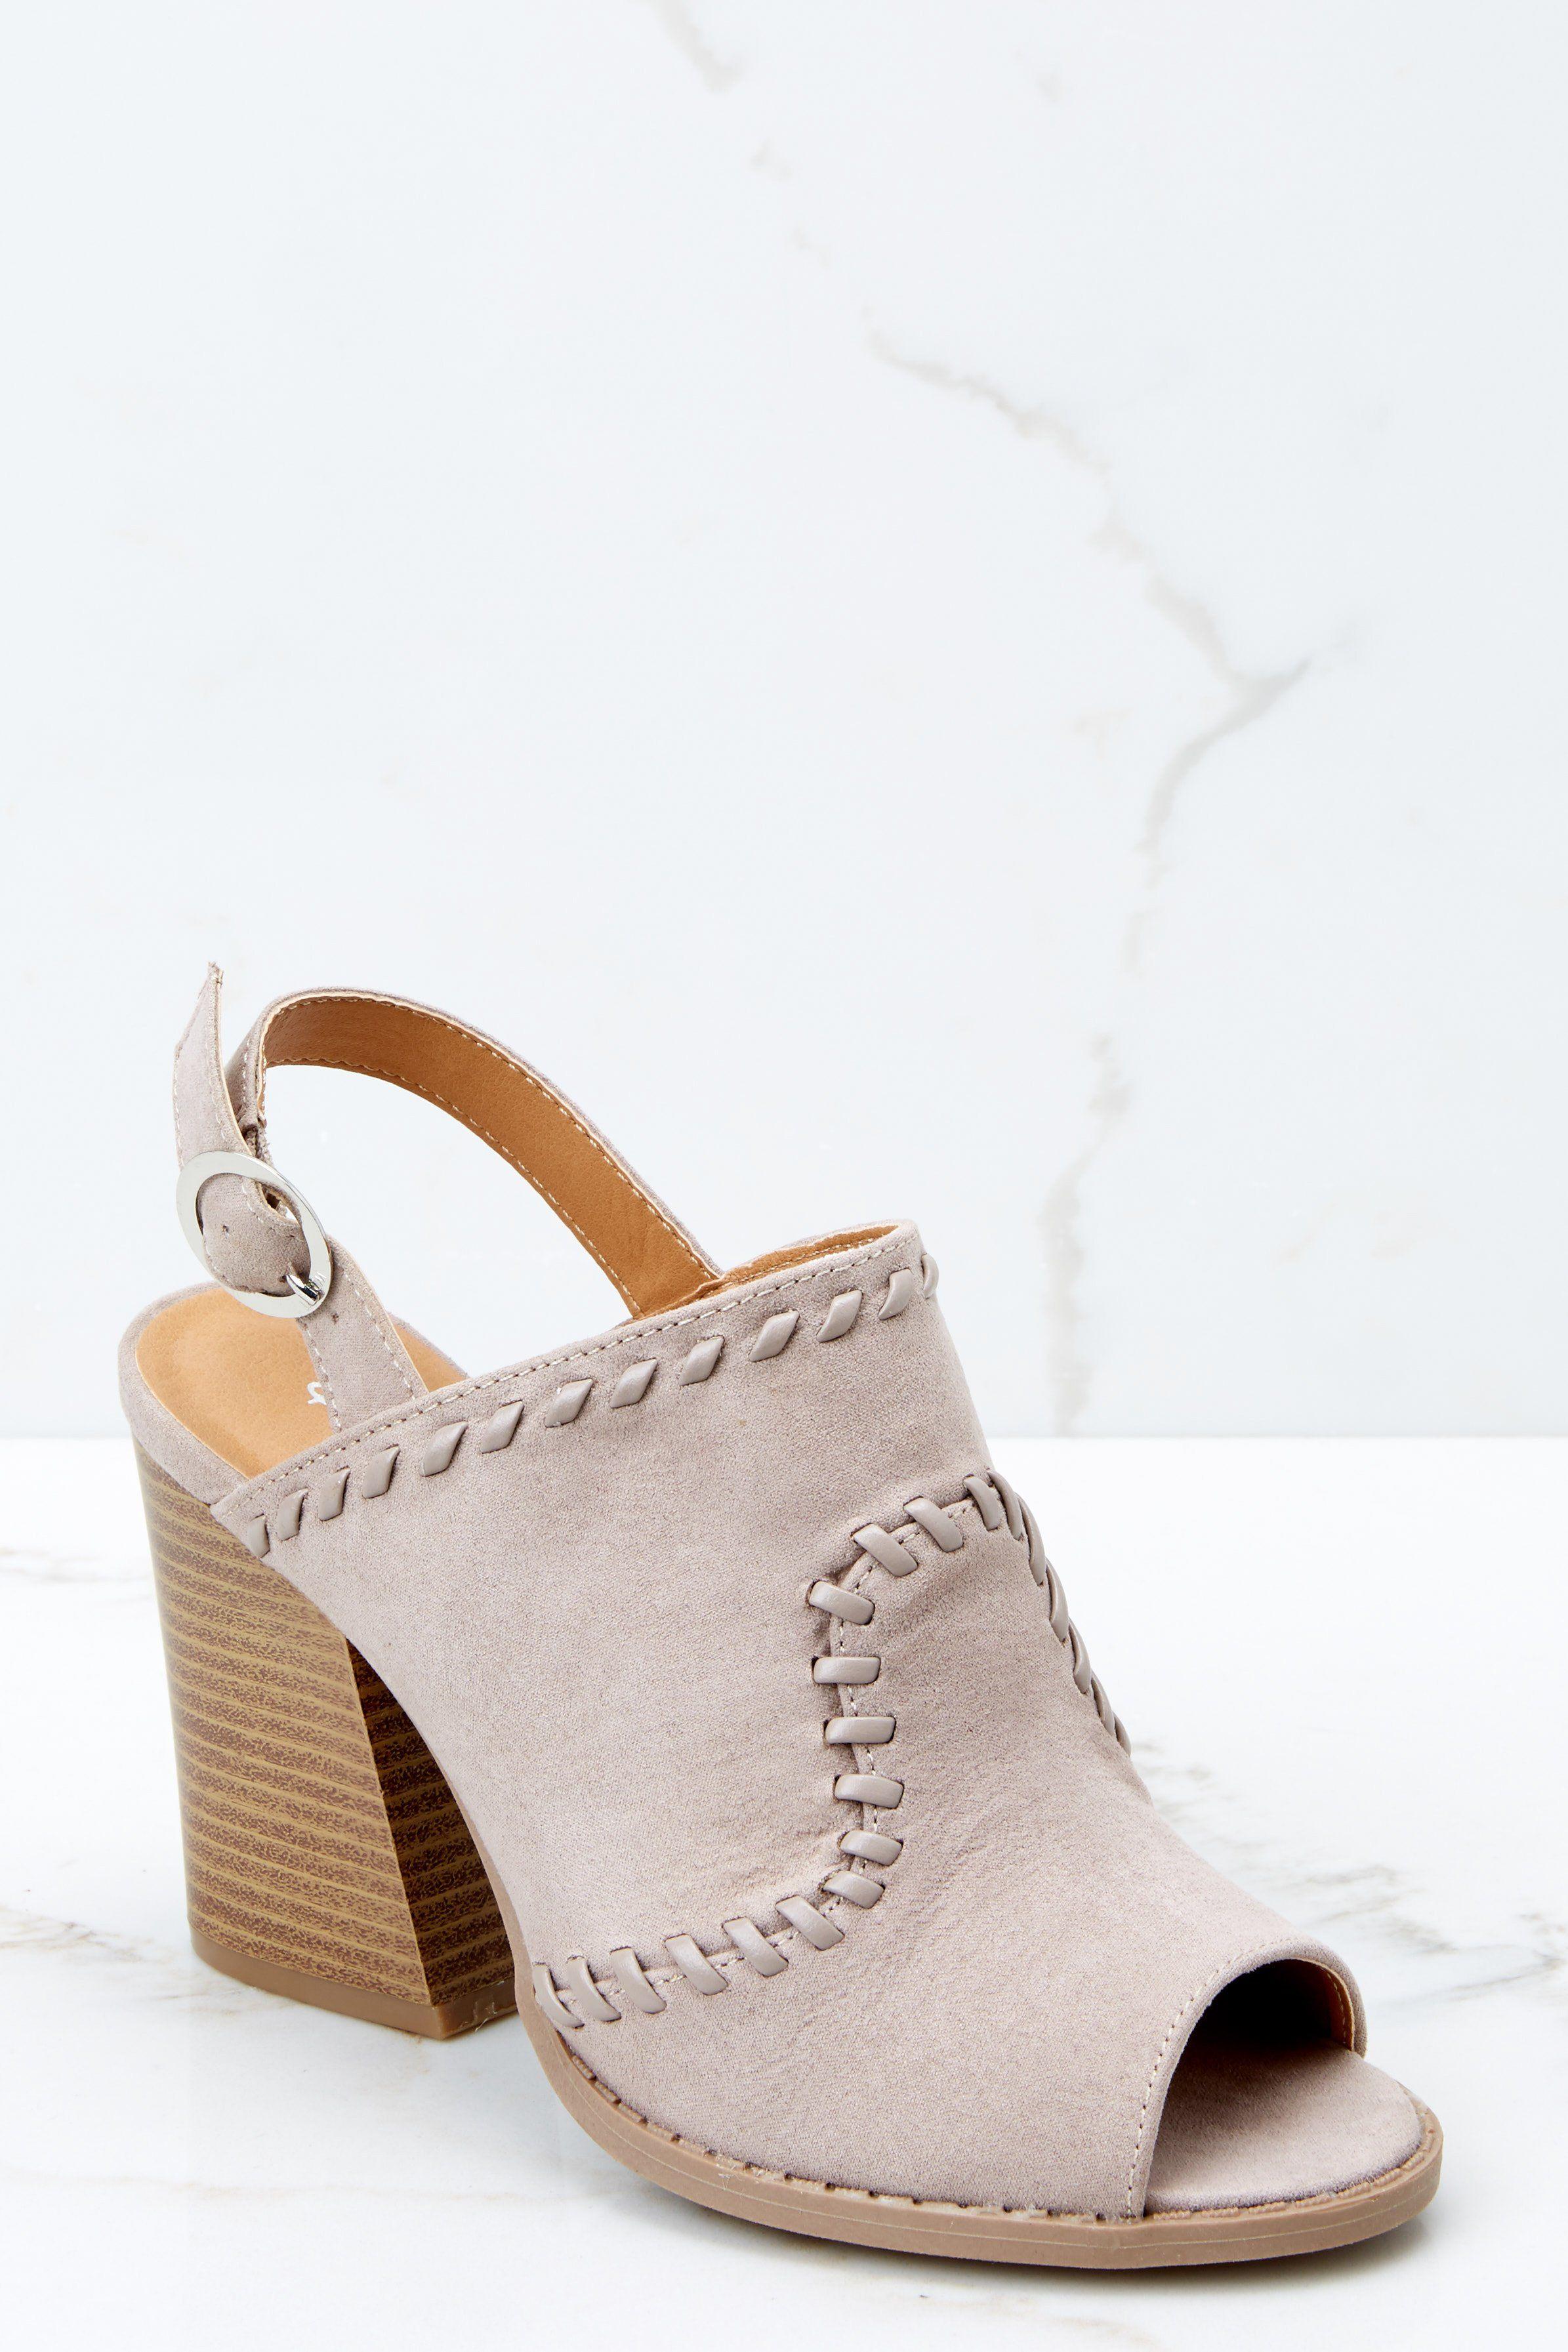 b5ec63a8cc0b Trendy Taupe Peep Toe Heels - Taupe Heels - Heels -  38.00 – Red Dress  Boutique